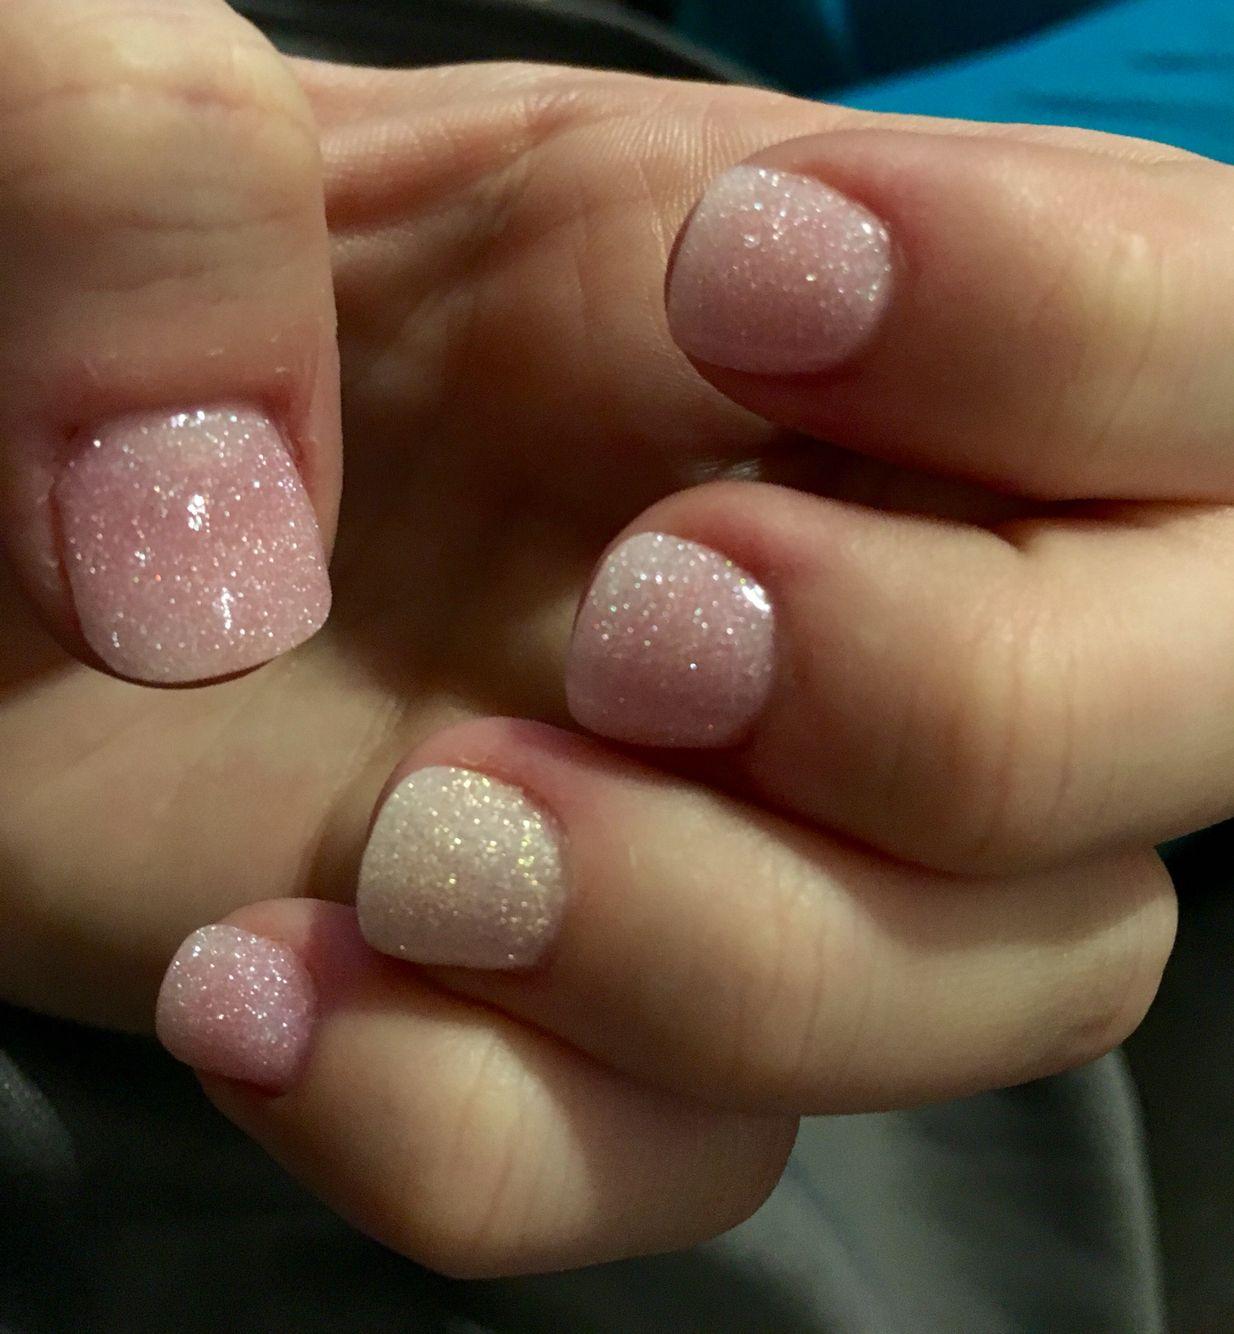 Pink Glitter White Glitter Powder Dipped Nails Manicure Mani Winter Nails Natural Powder Nails Dipped Nails Sparkle Acrylic Nails